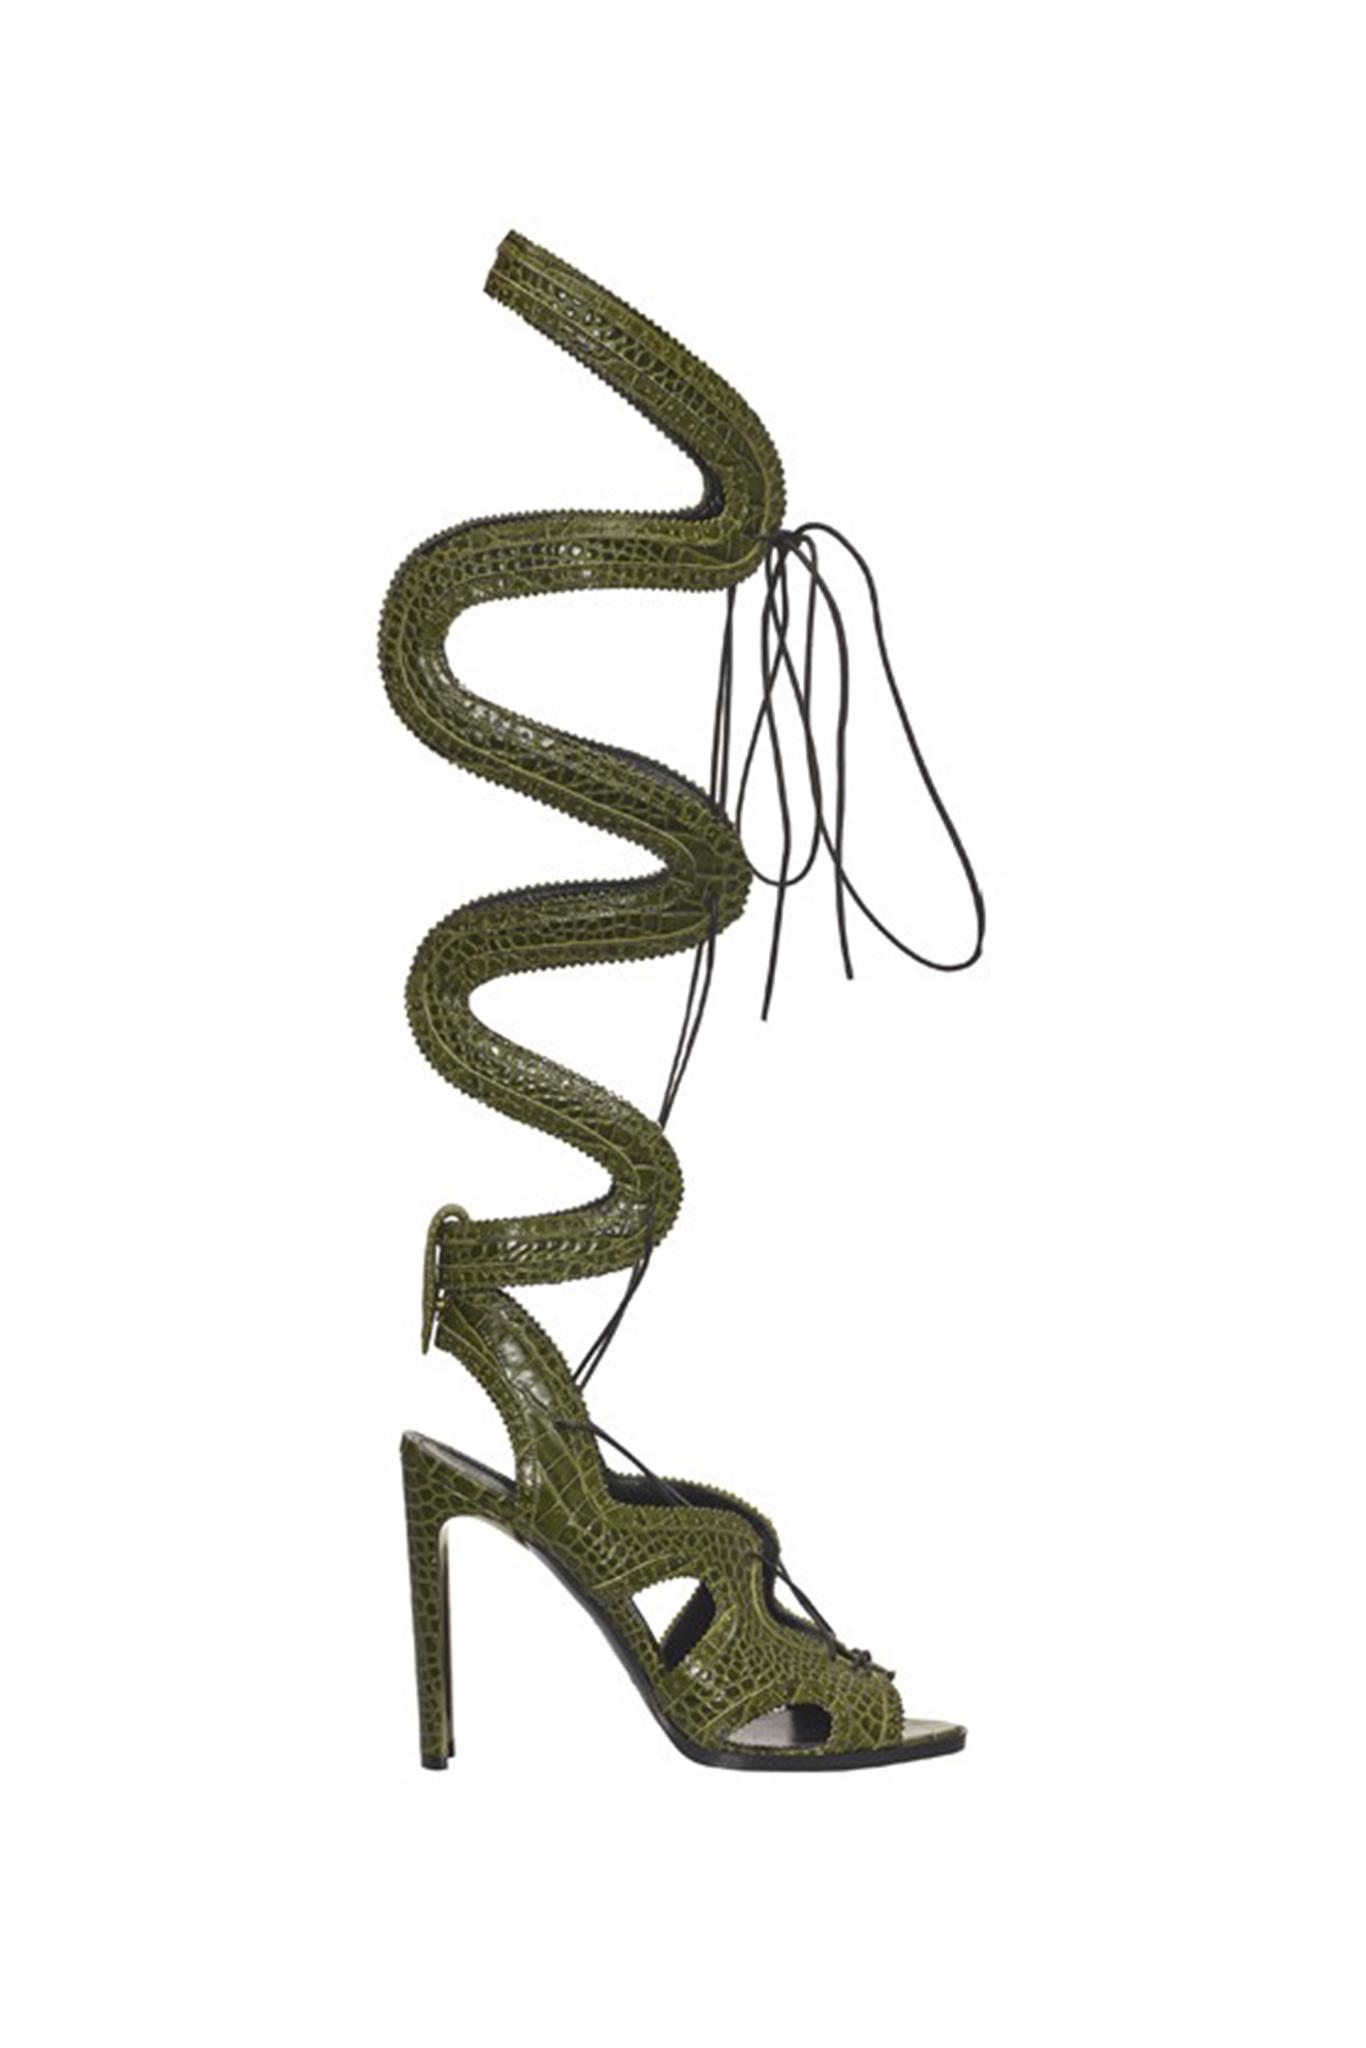 03-04-heeled-gladiator.jpg